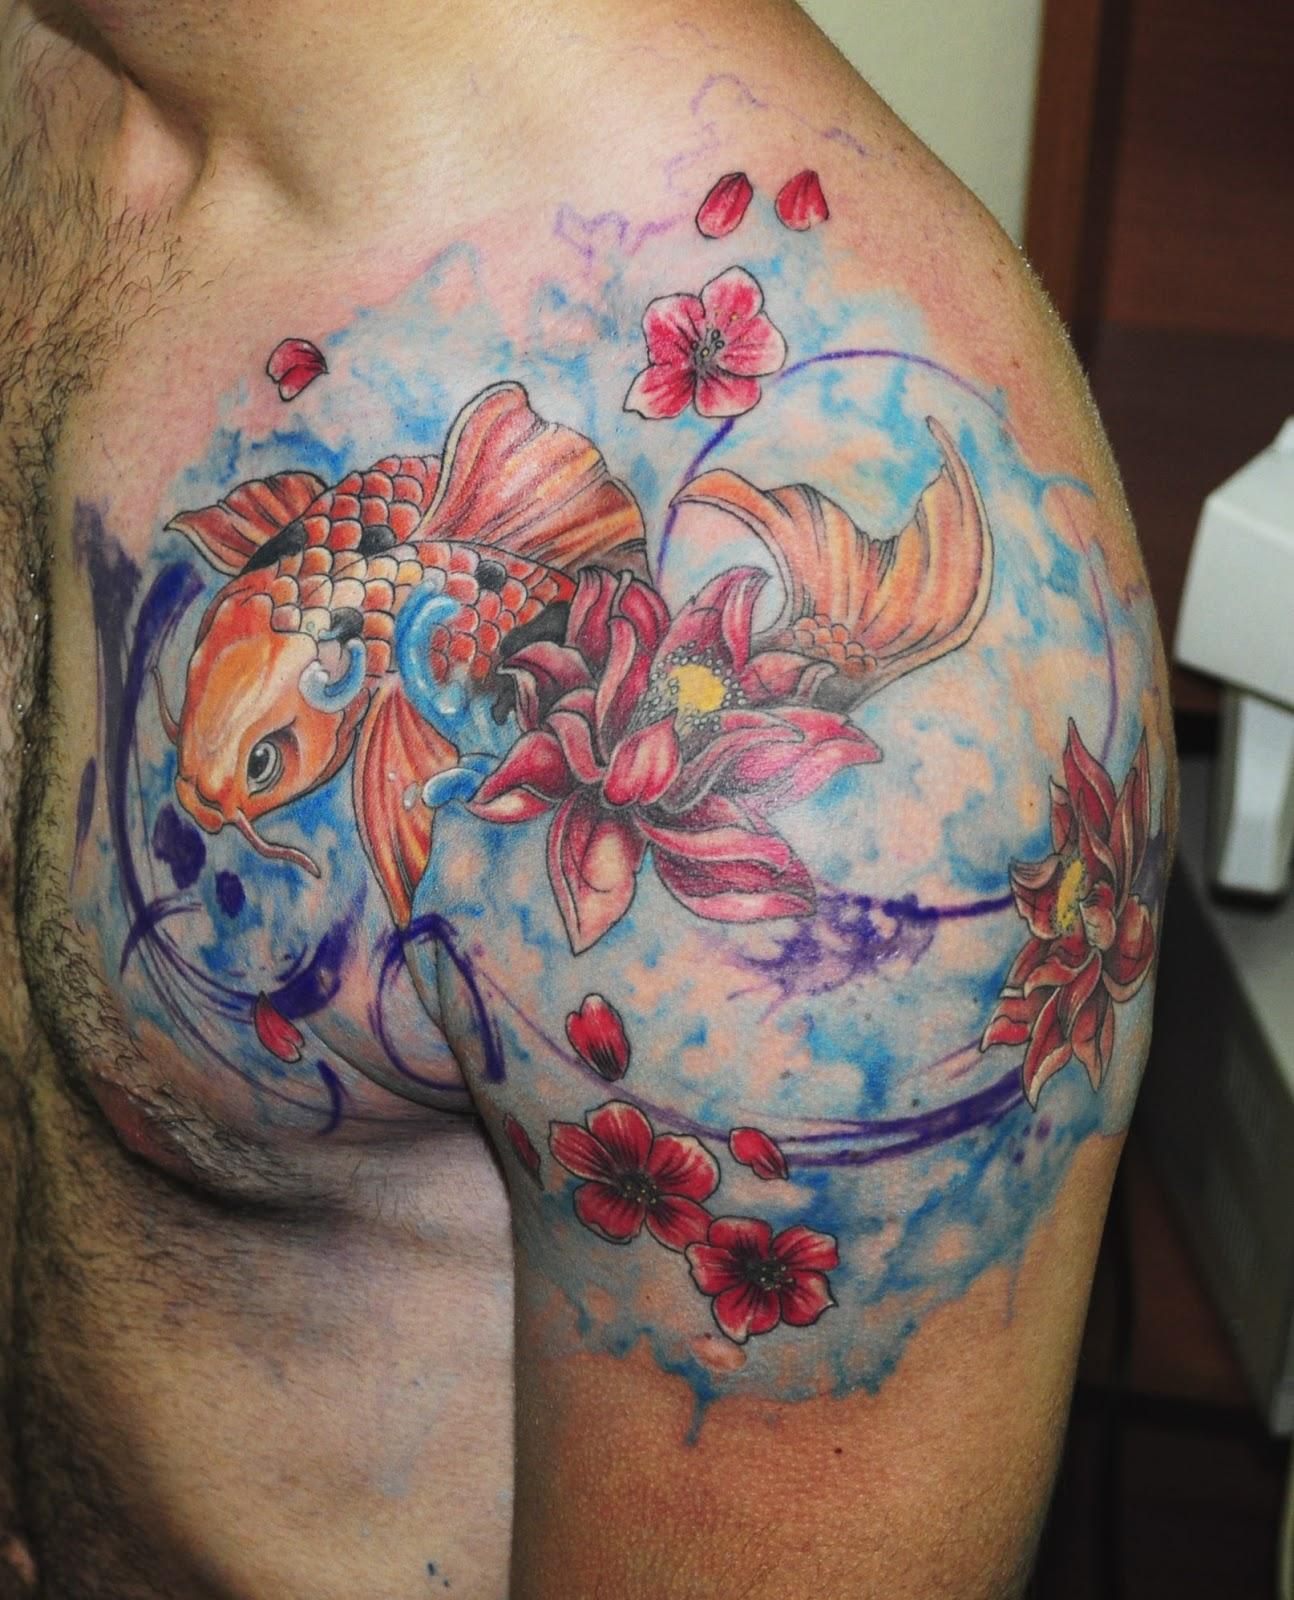 Painful tattoo areas amazing watercolour tattoos for Koi carp tattoo colours